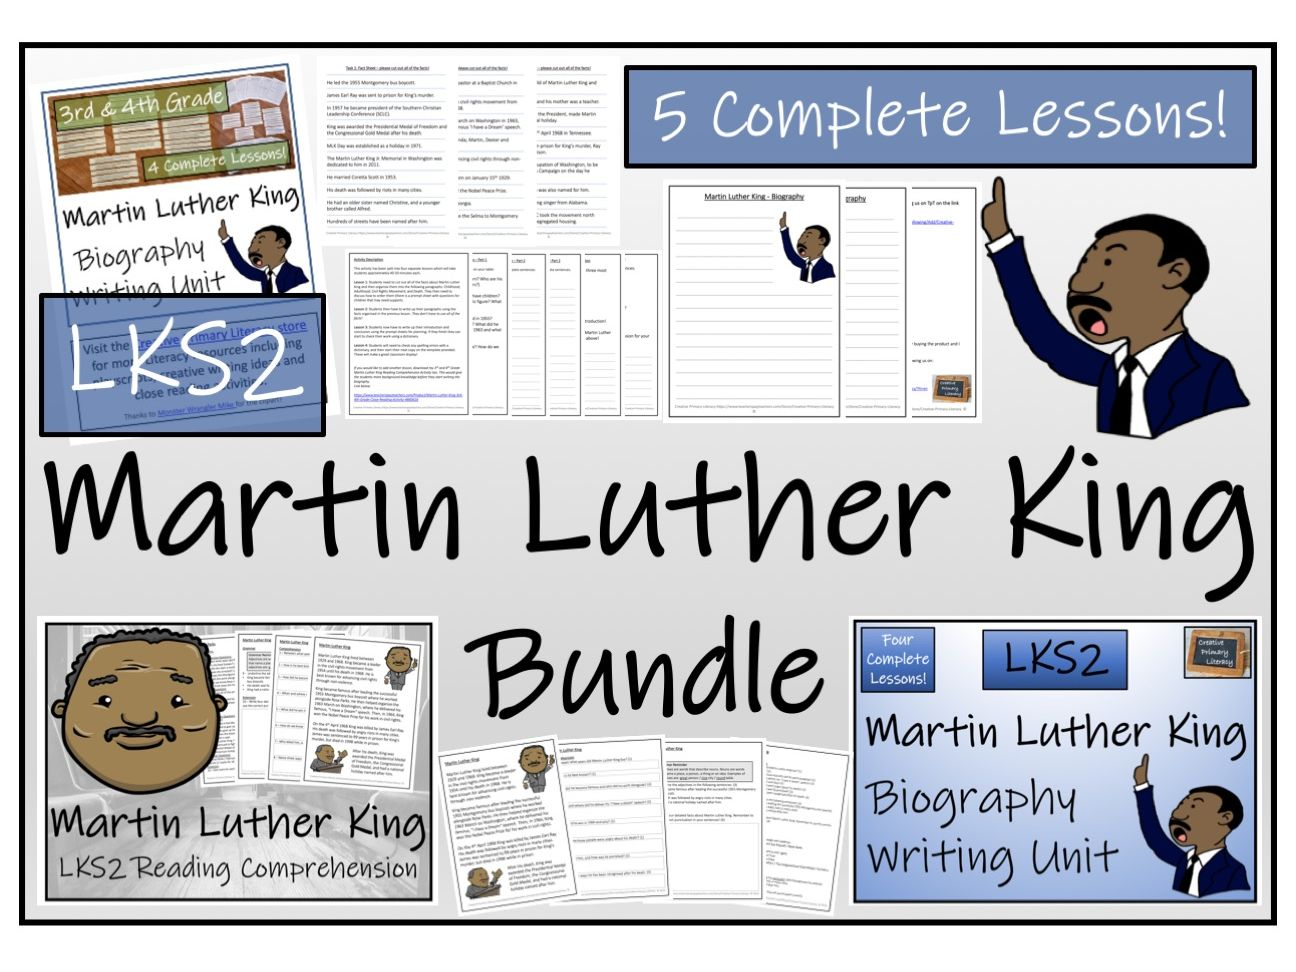 LKS2 History - Martin Luther King Reading Comprehension & Biography Bundle